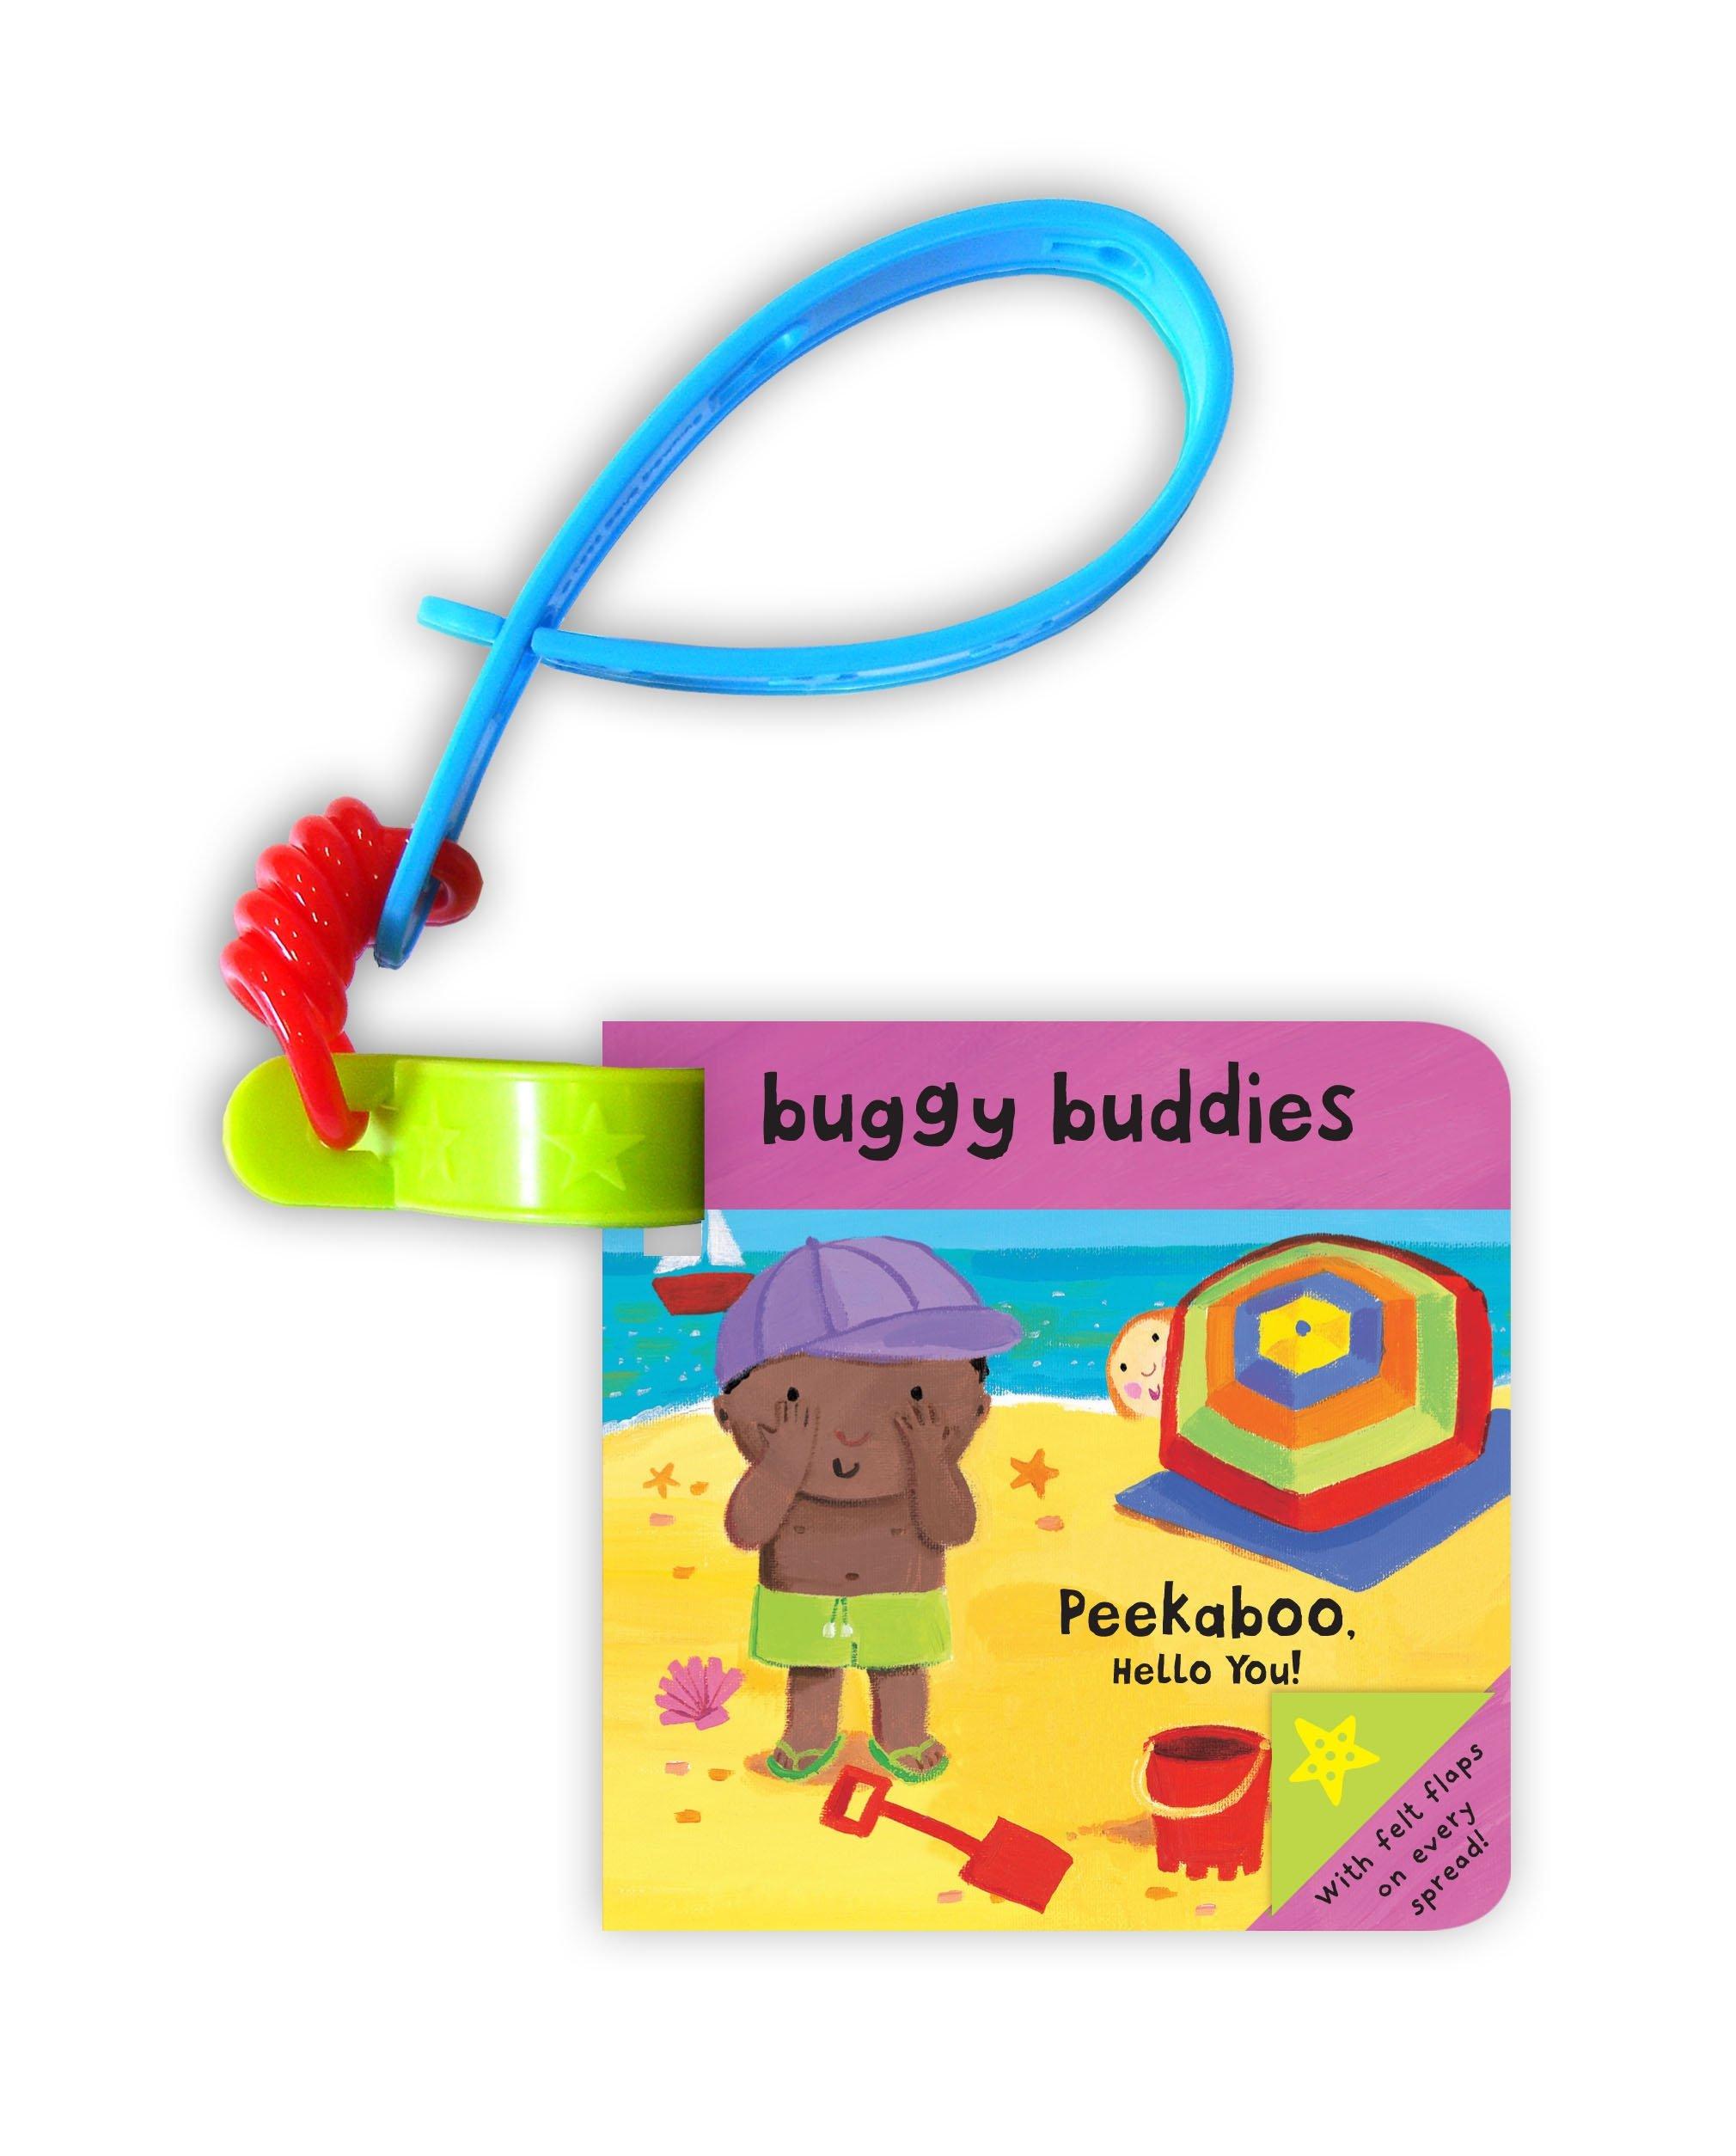 Download Peekaboo, Hello You! (Little Peekaboo Buggy Buddies) PDF